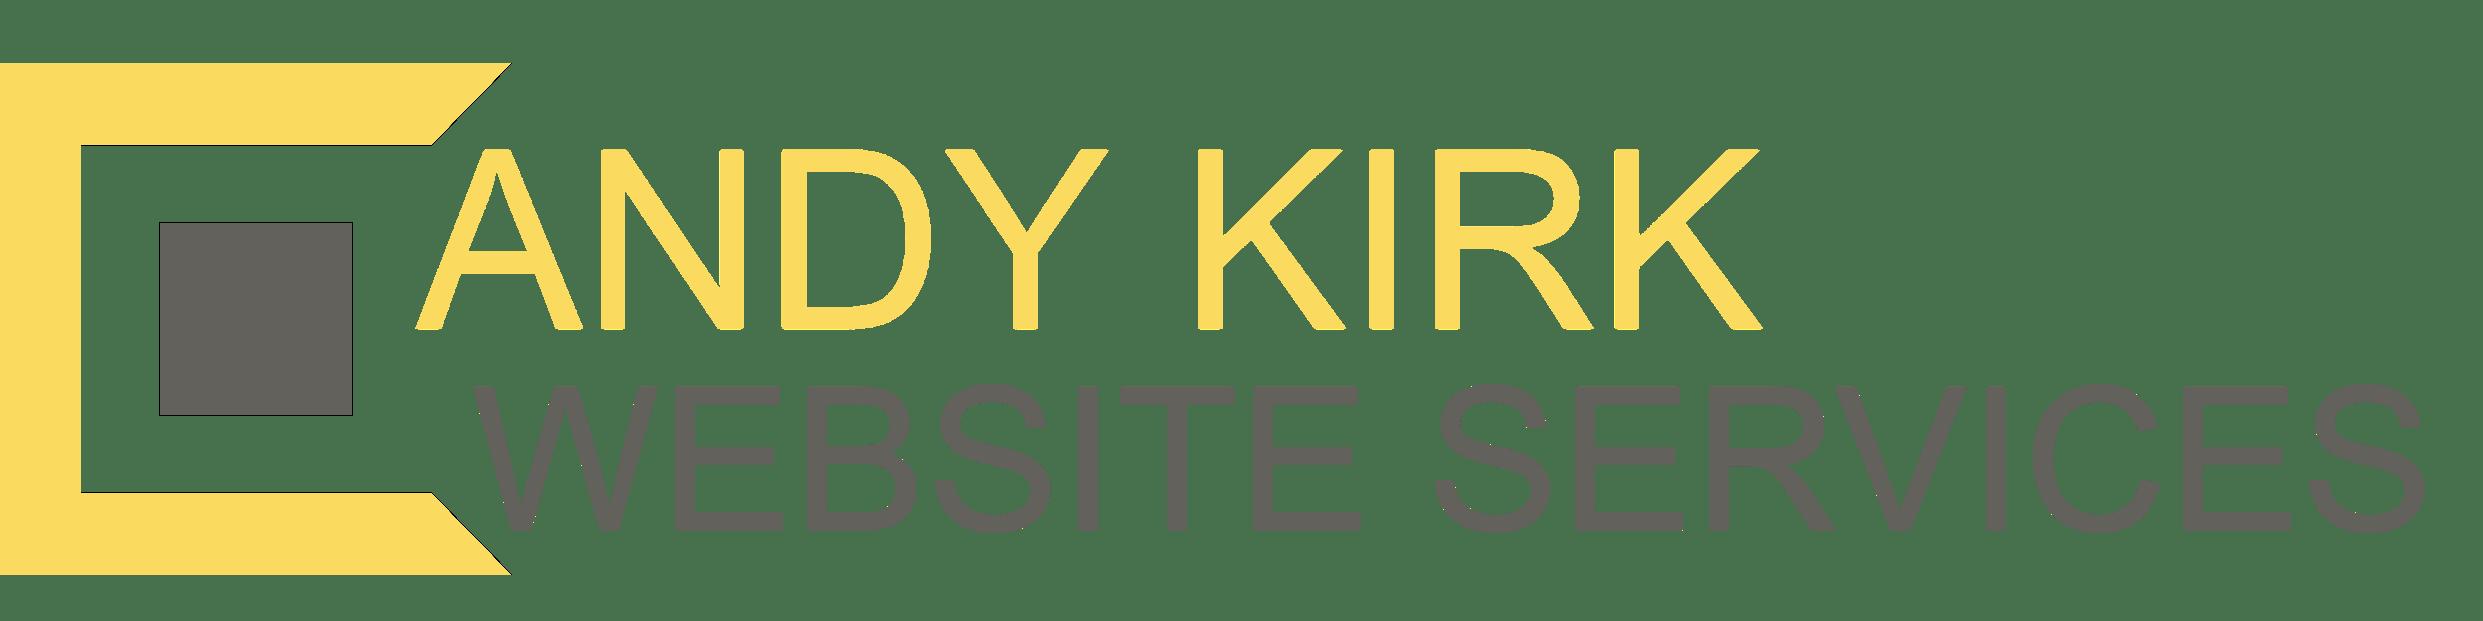 Andy Kirk Web Design